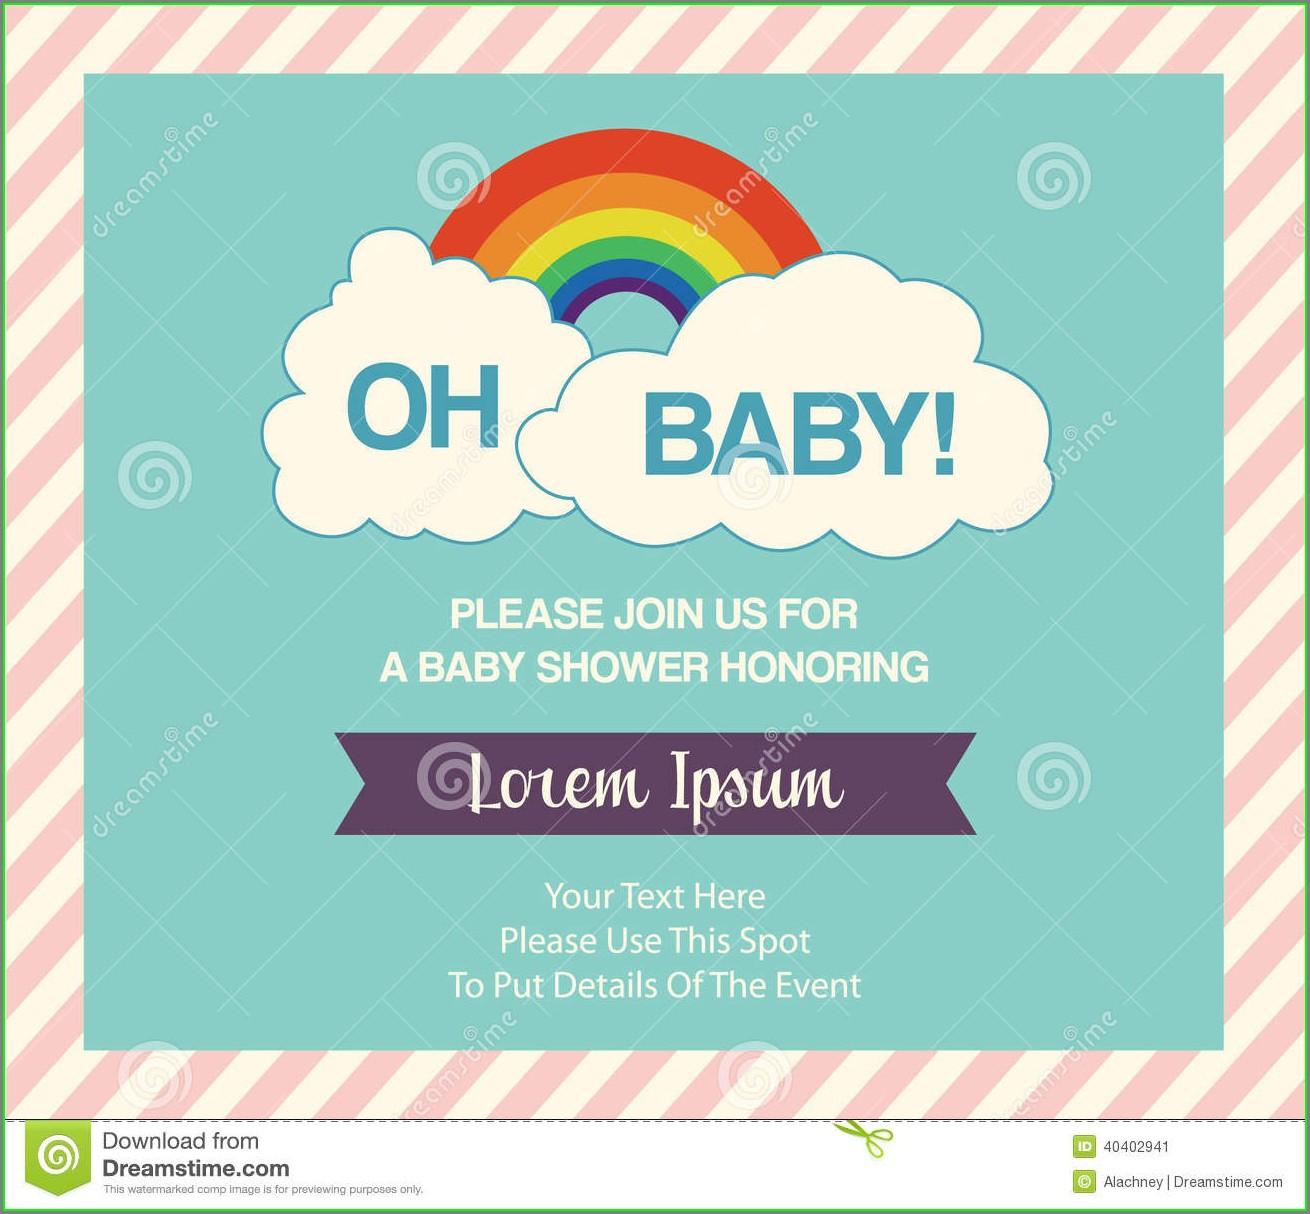 Baby Shower Invitation Templates Online